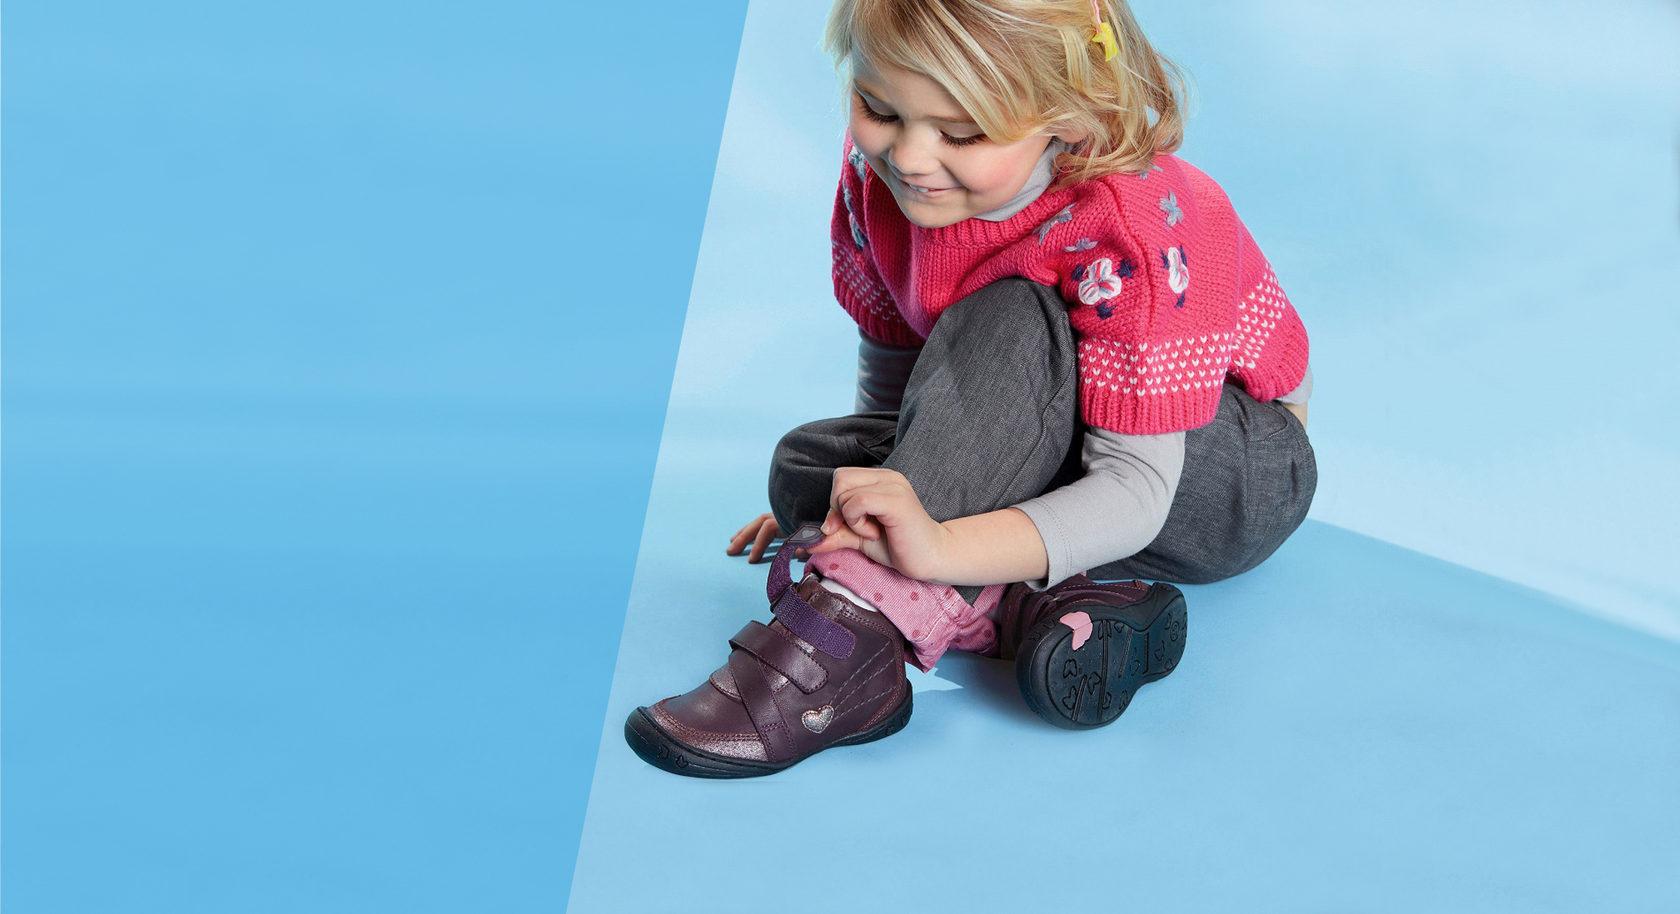 Картинка ребенок и обувь